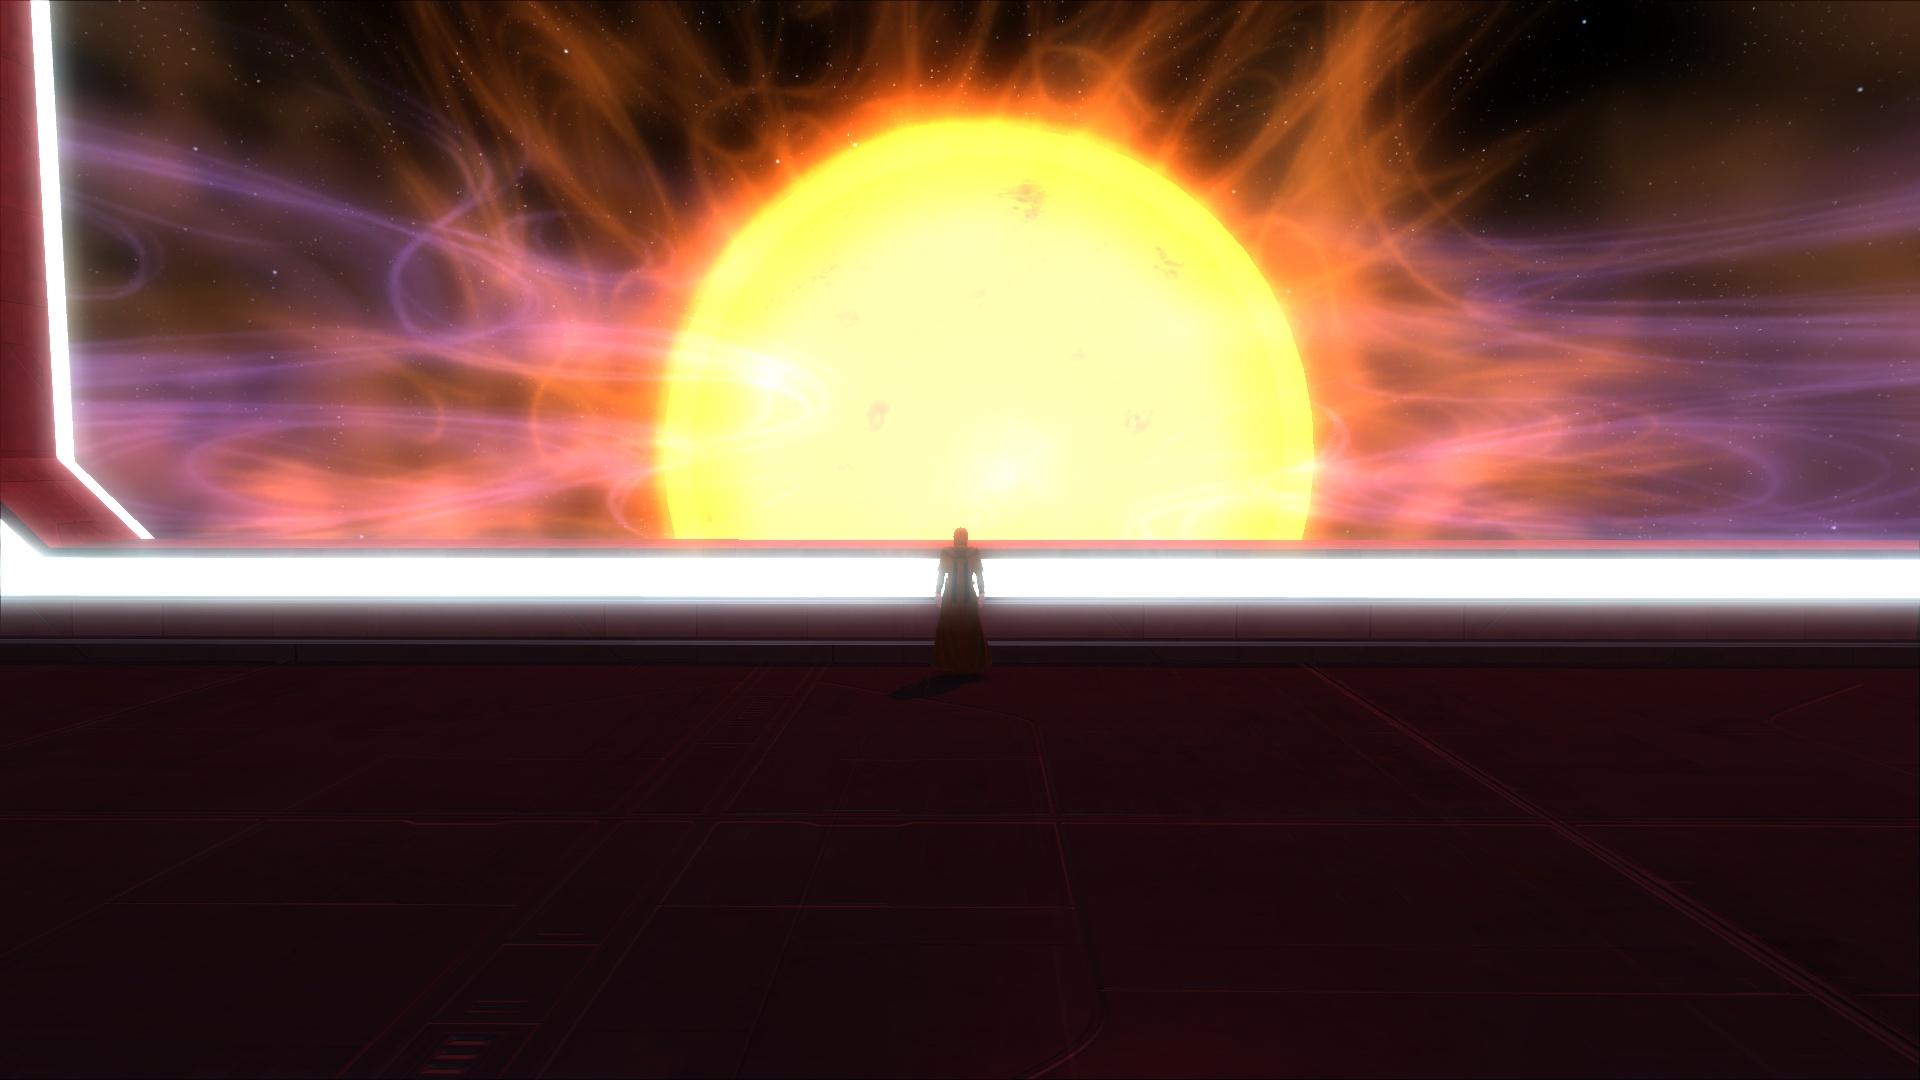 screenshot_2012-01-04xoa8w.jpg